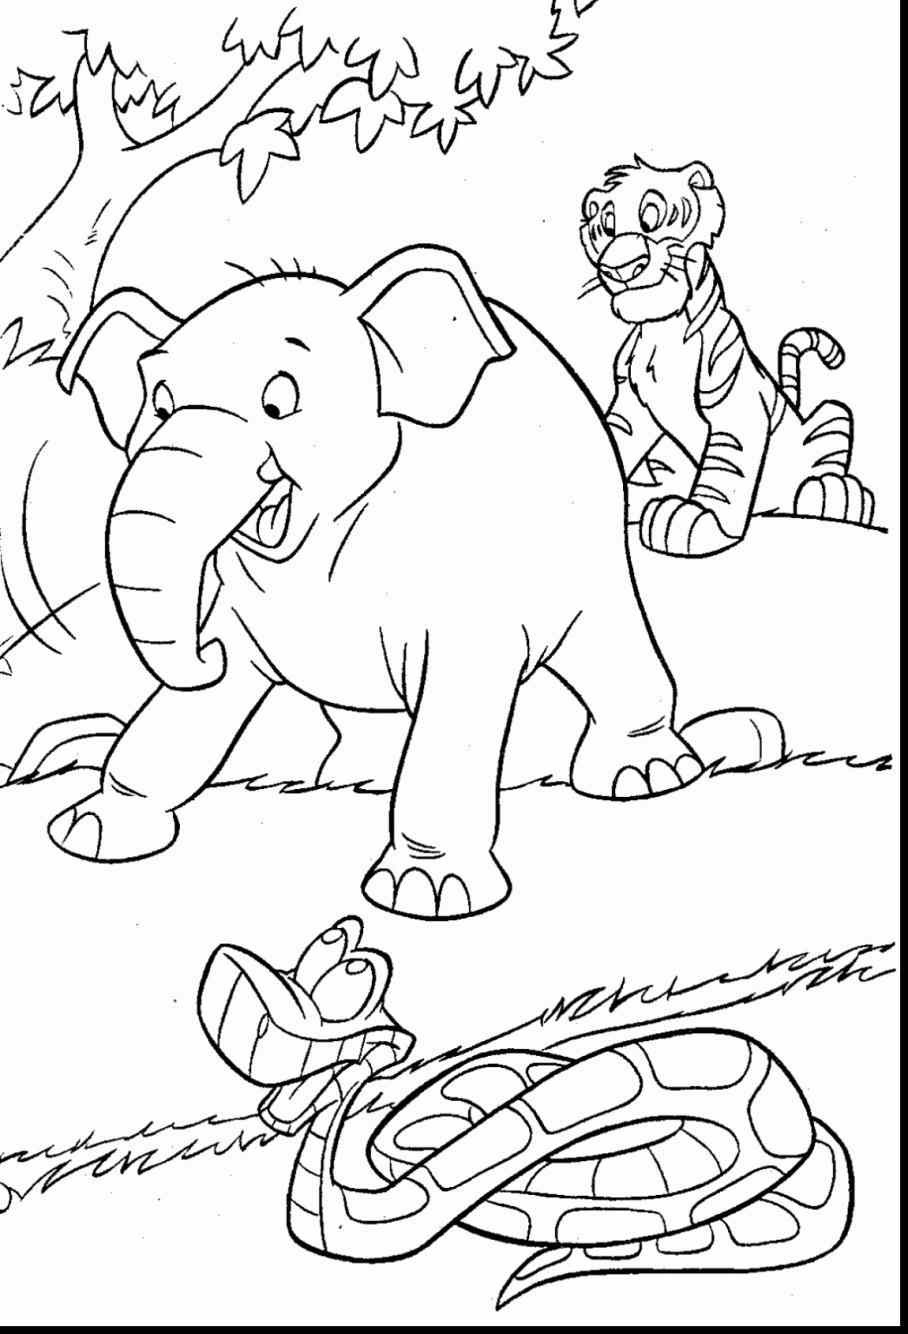 Drawn rainforest jungle scenery Coloring Jungle scene pinterest pages